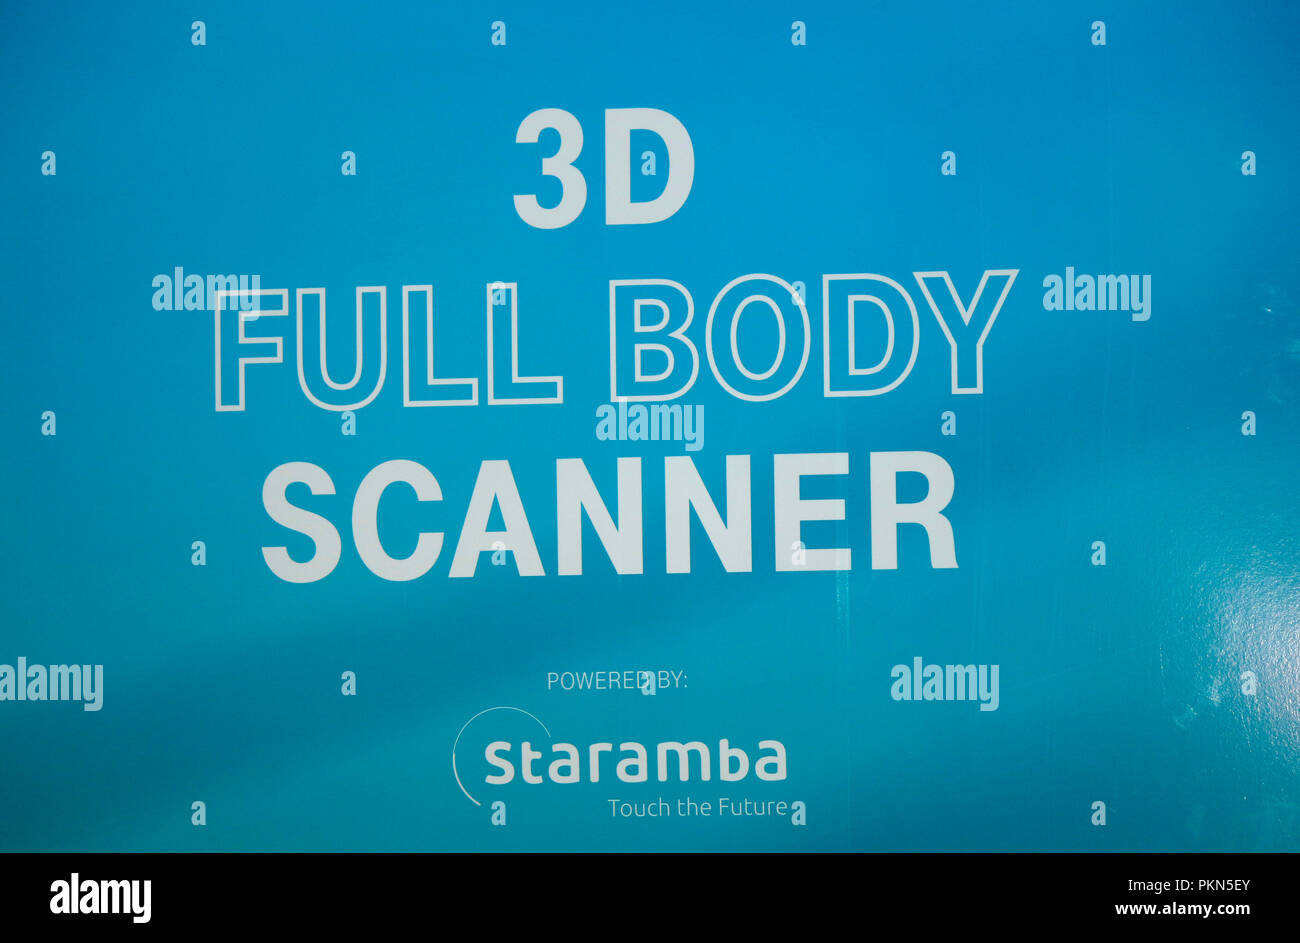 ein '3d Full Body Scanner' der Firma 'Staramba', Berlin. - Stock Image